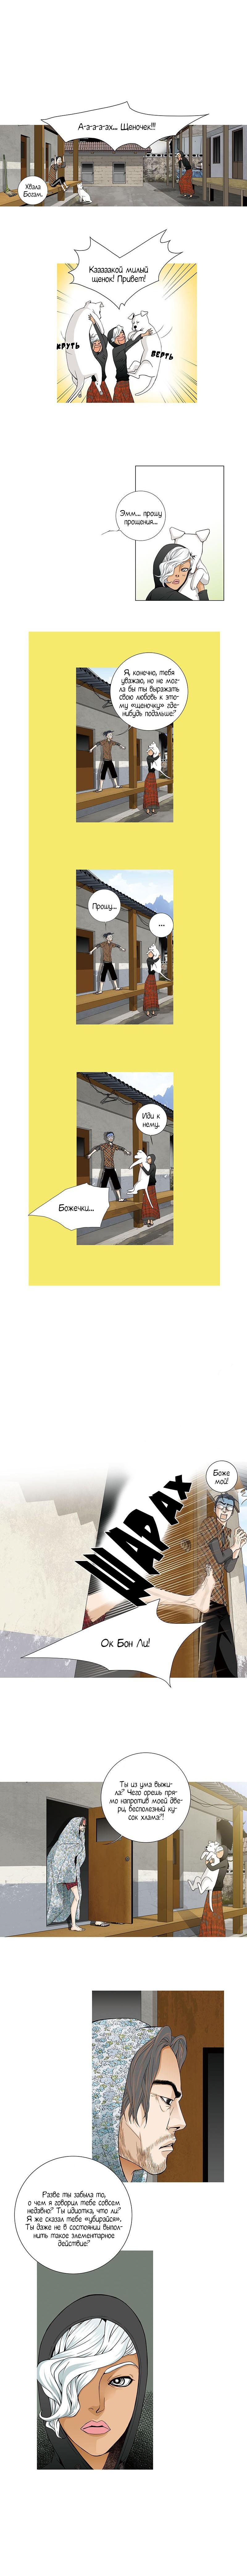 https://r1.ninemanga.com/comics/pic2/29/28573/344322/1512078366284.jpg Page 4